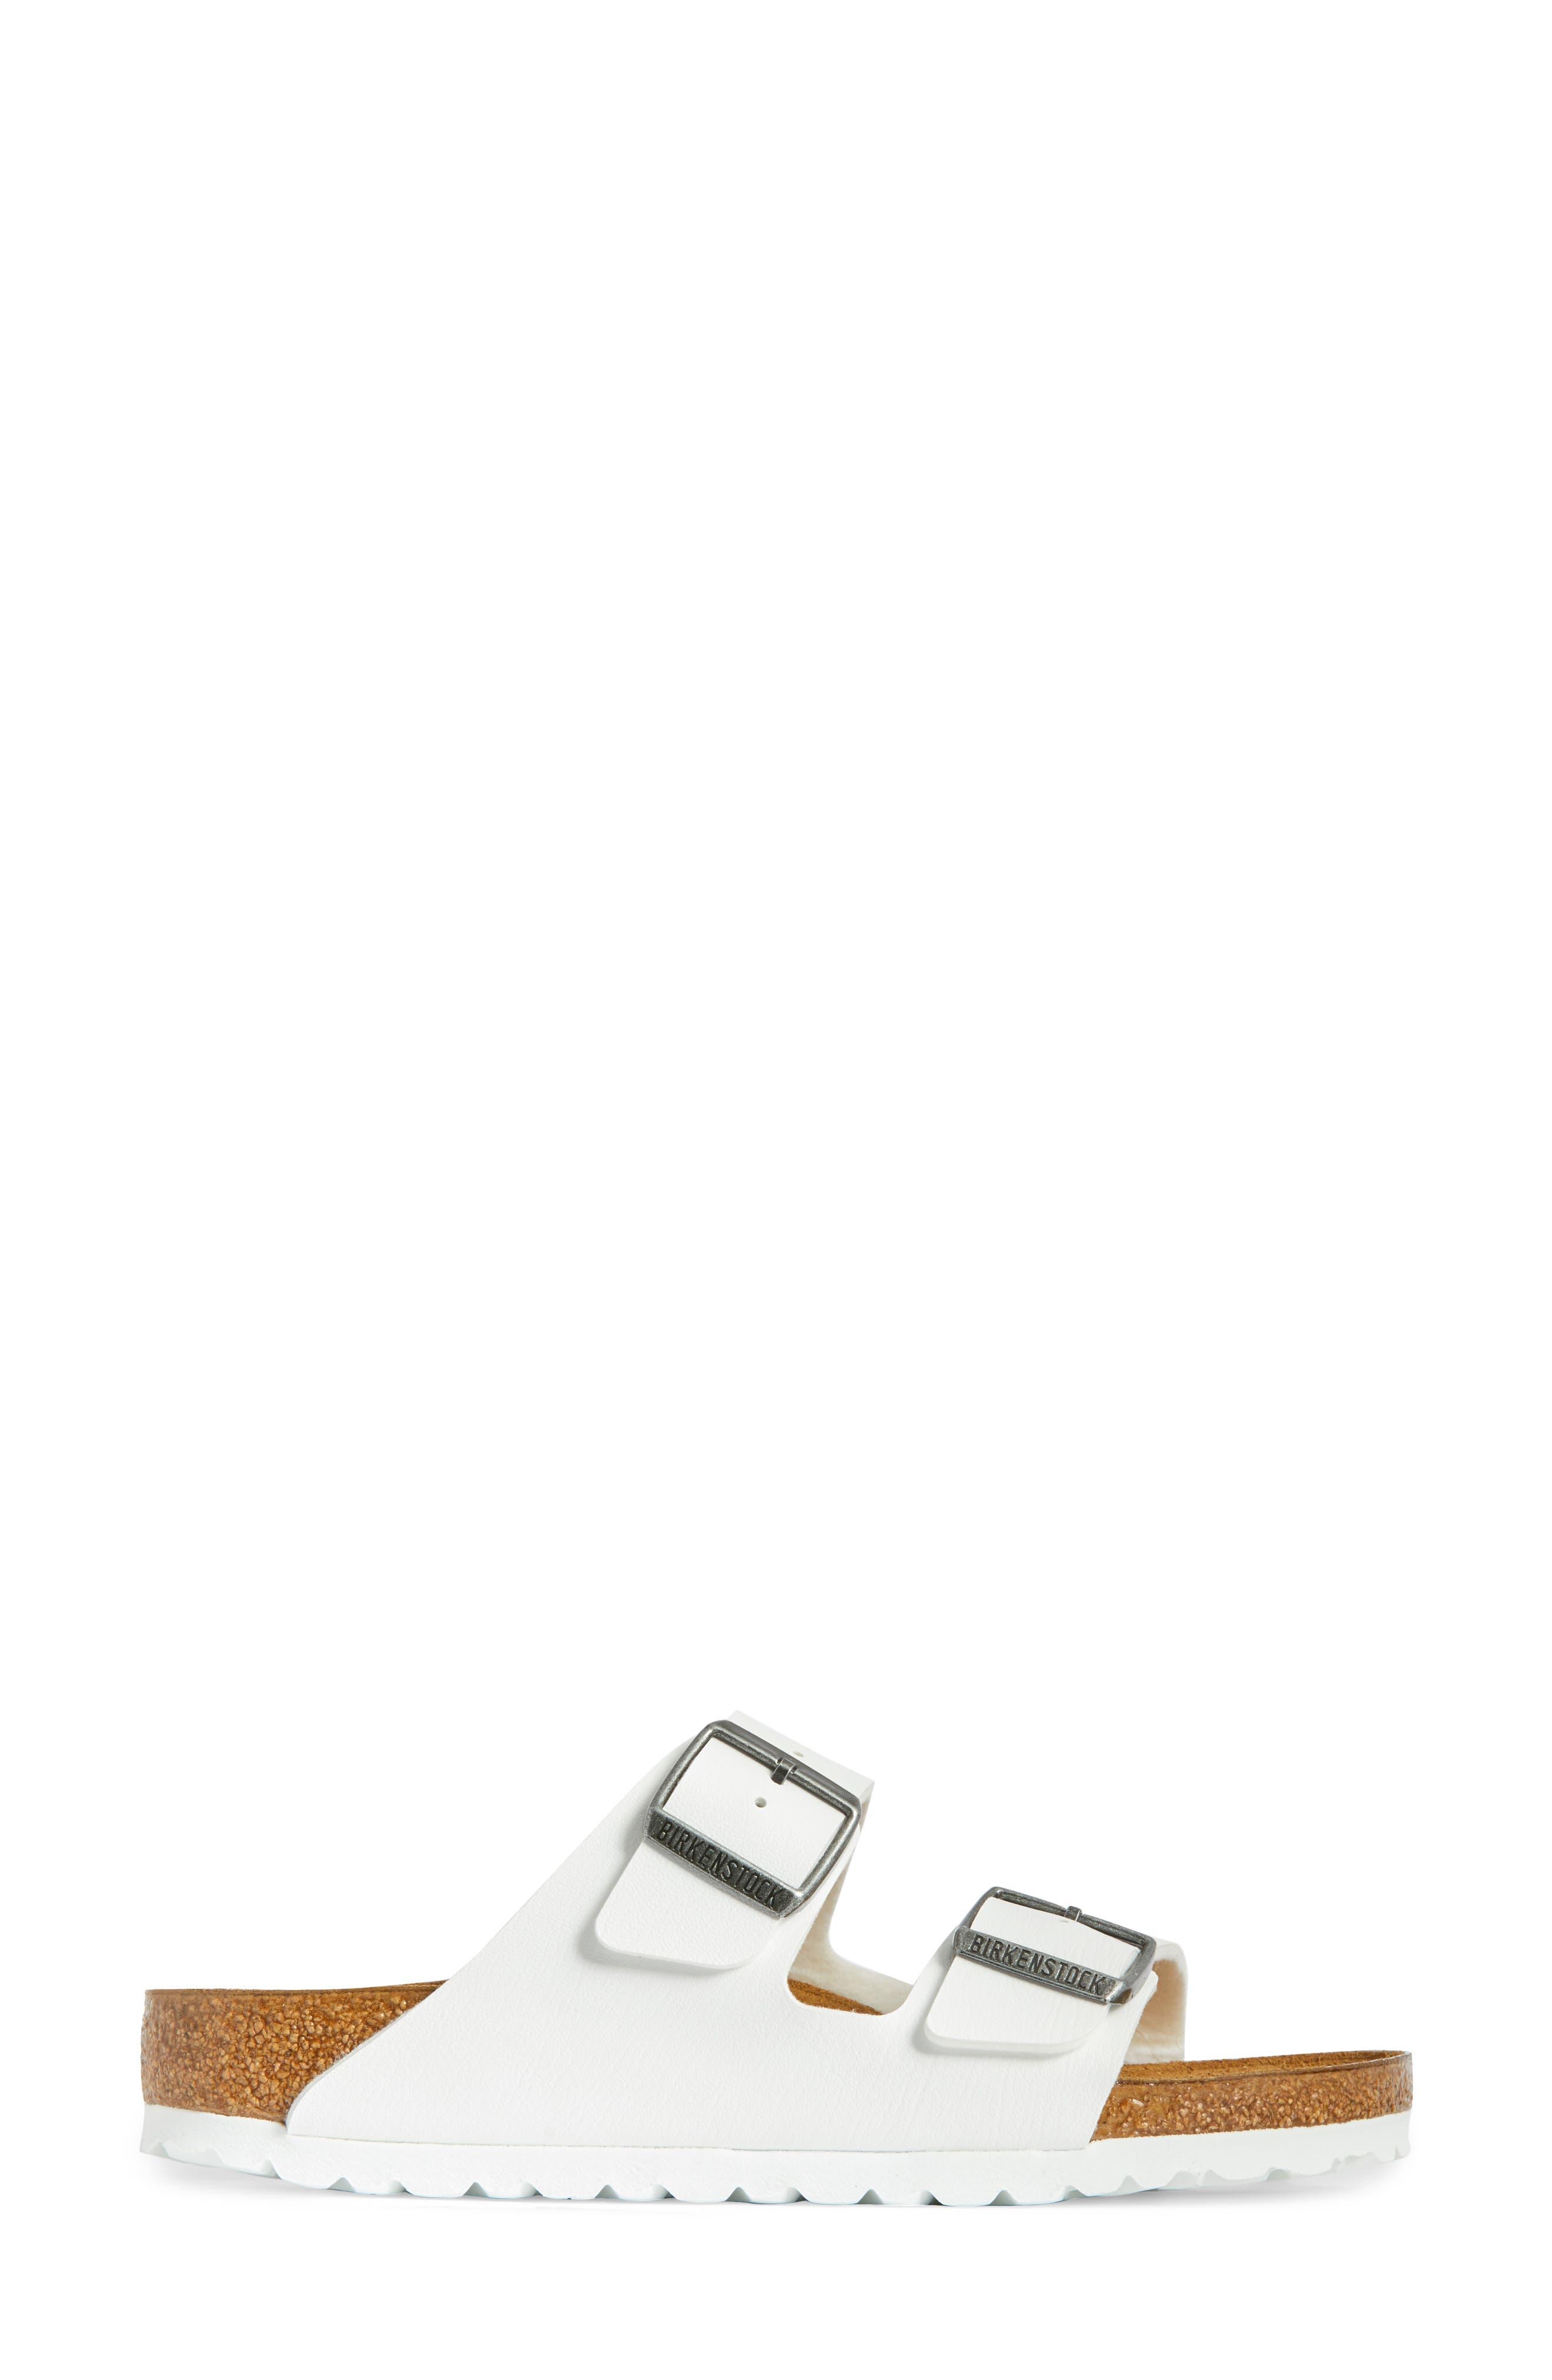 BIRKENSTOCK, 'Arizona' White Birko-Flor Sandal, Alternate thumbnail 3, color, WHITE SYNTHETIC LEATHER